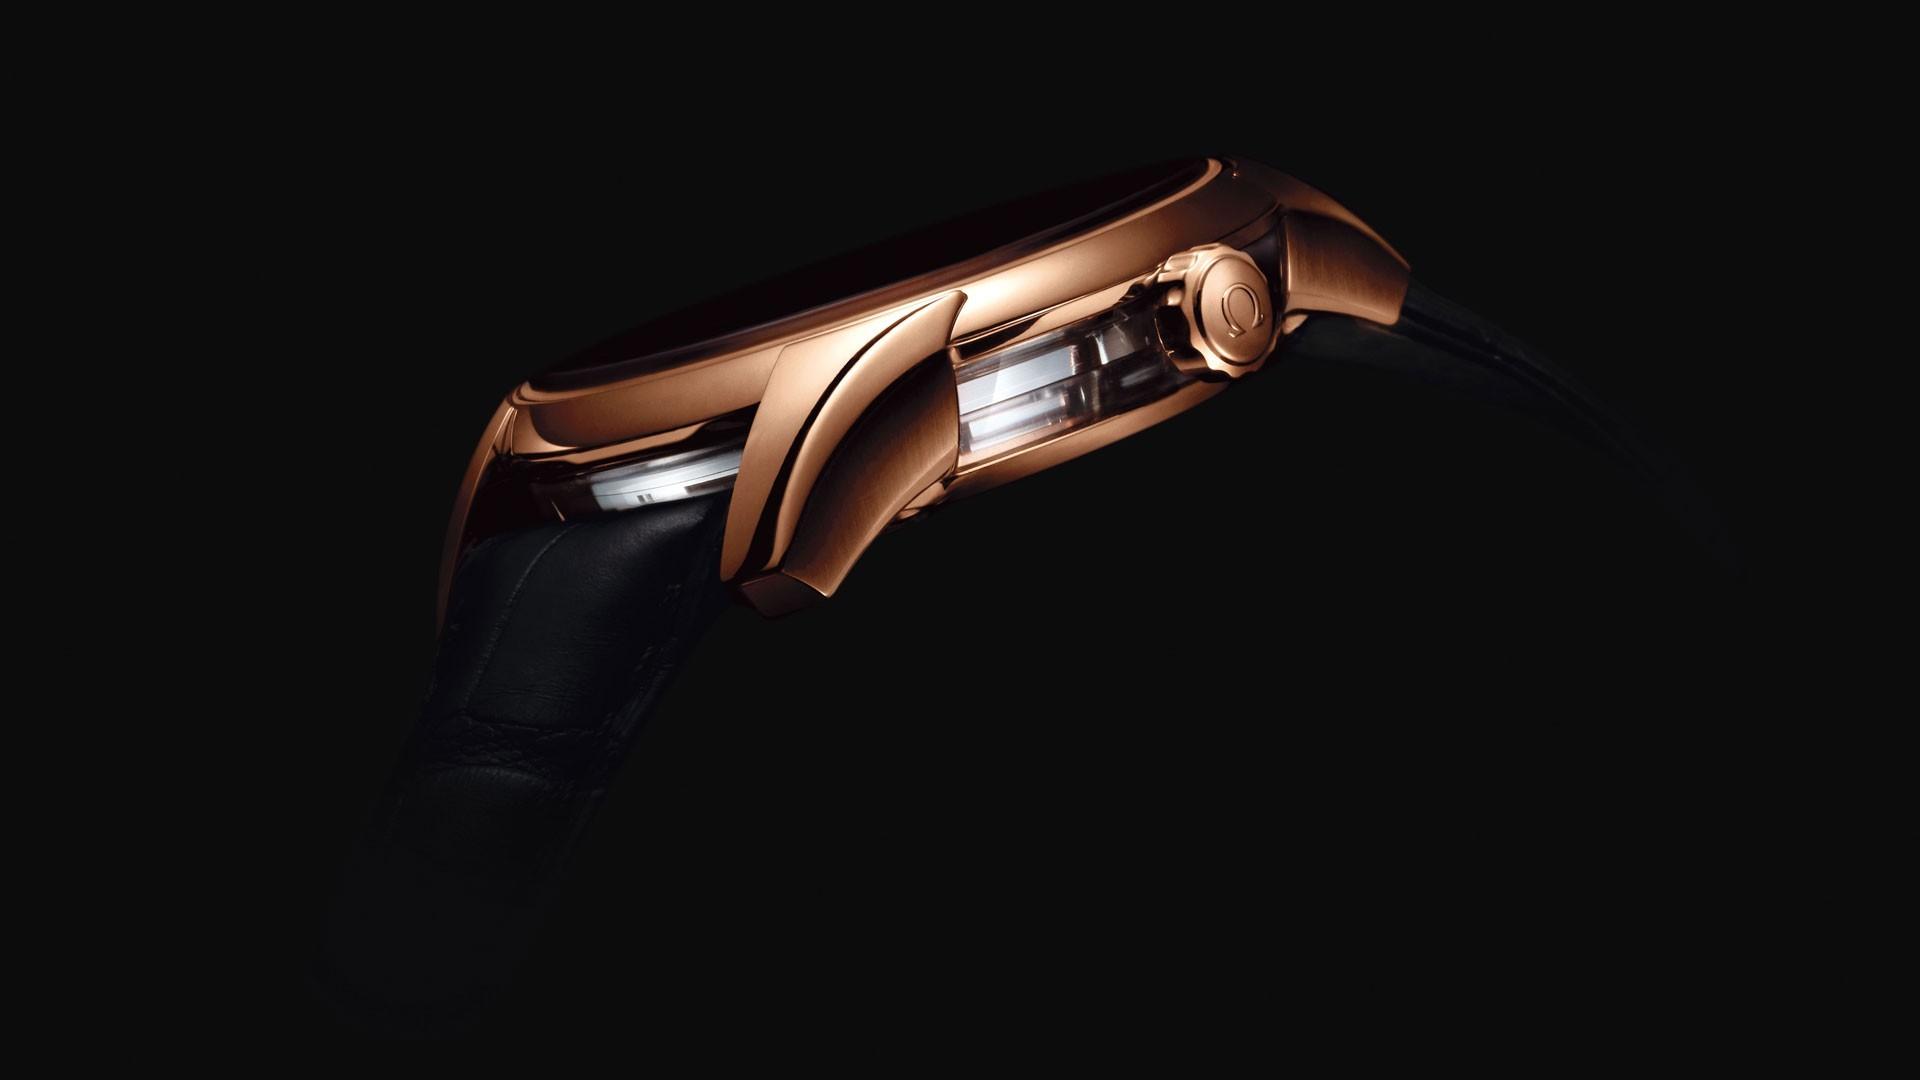 omega (watch) watch luxury watches